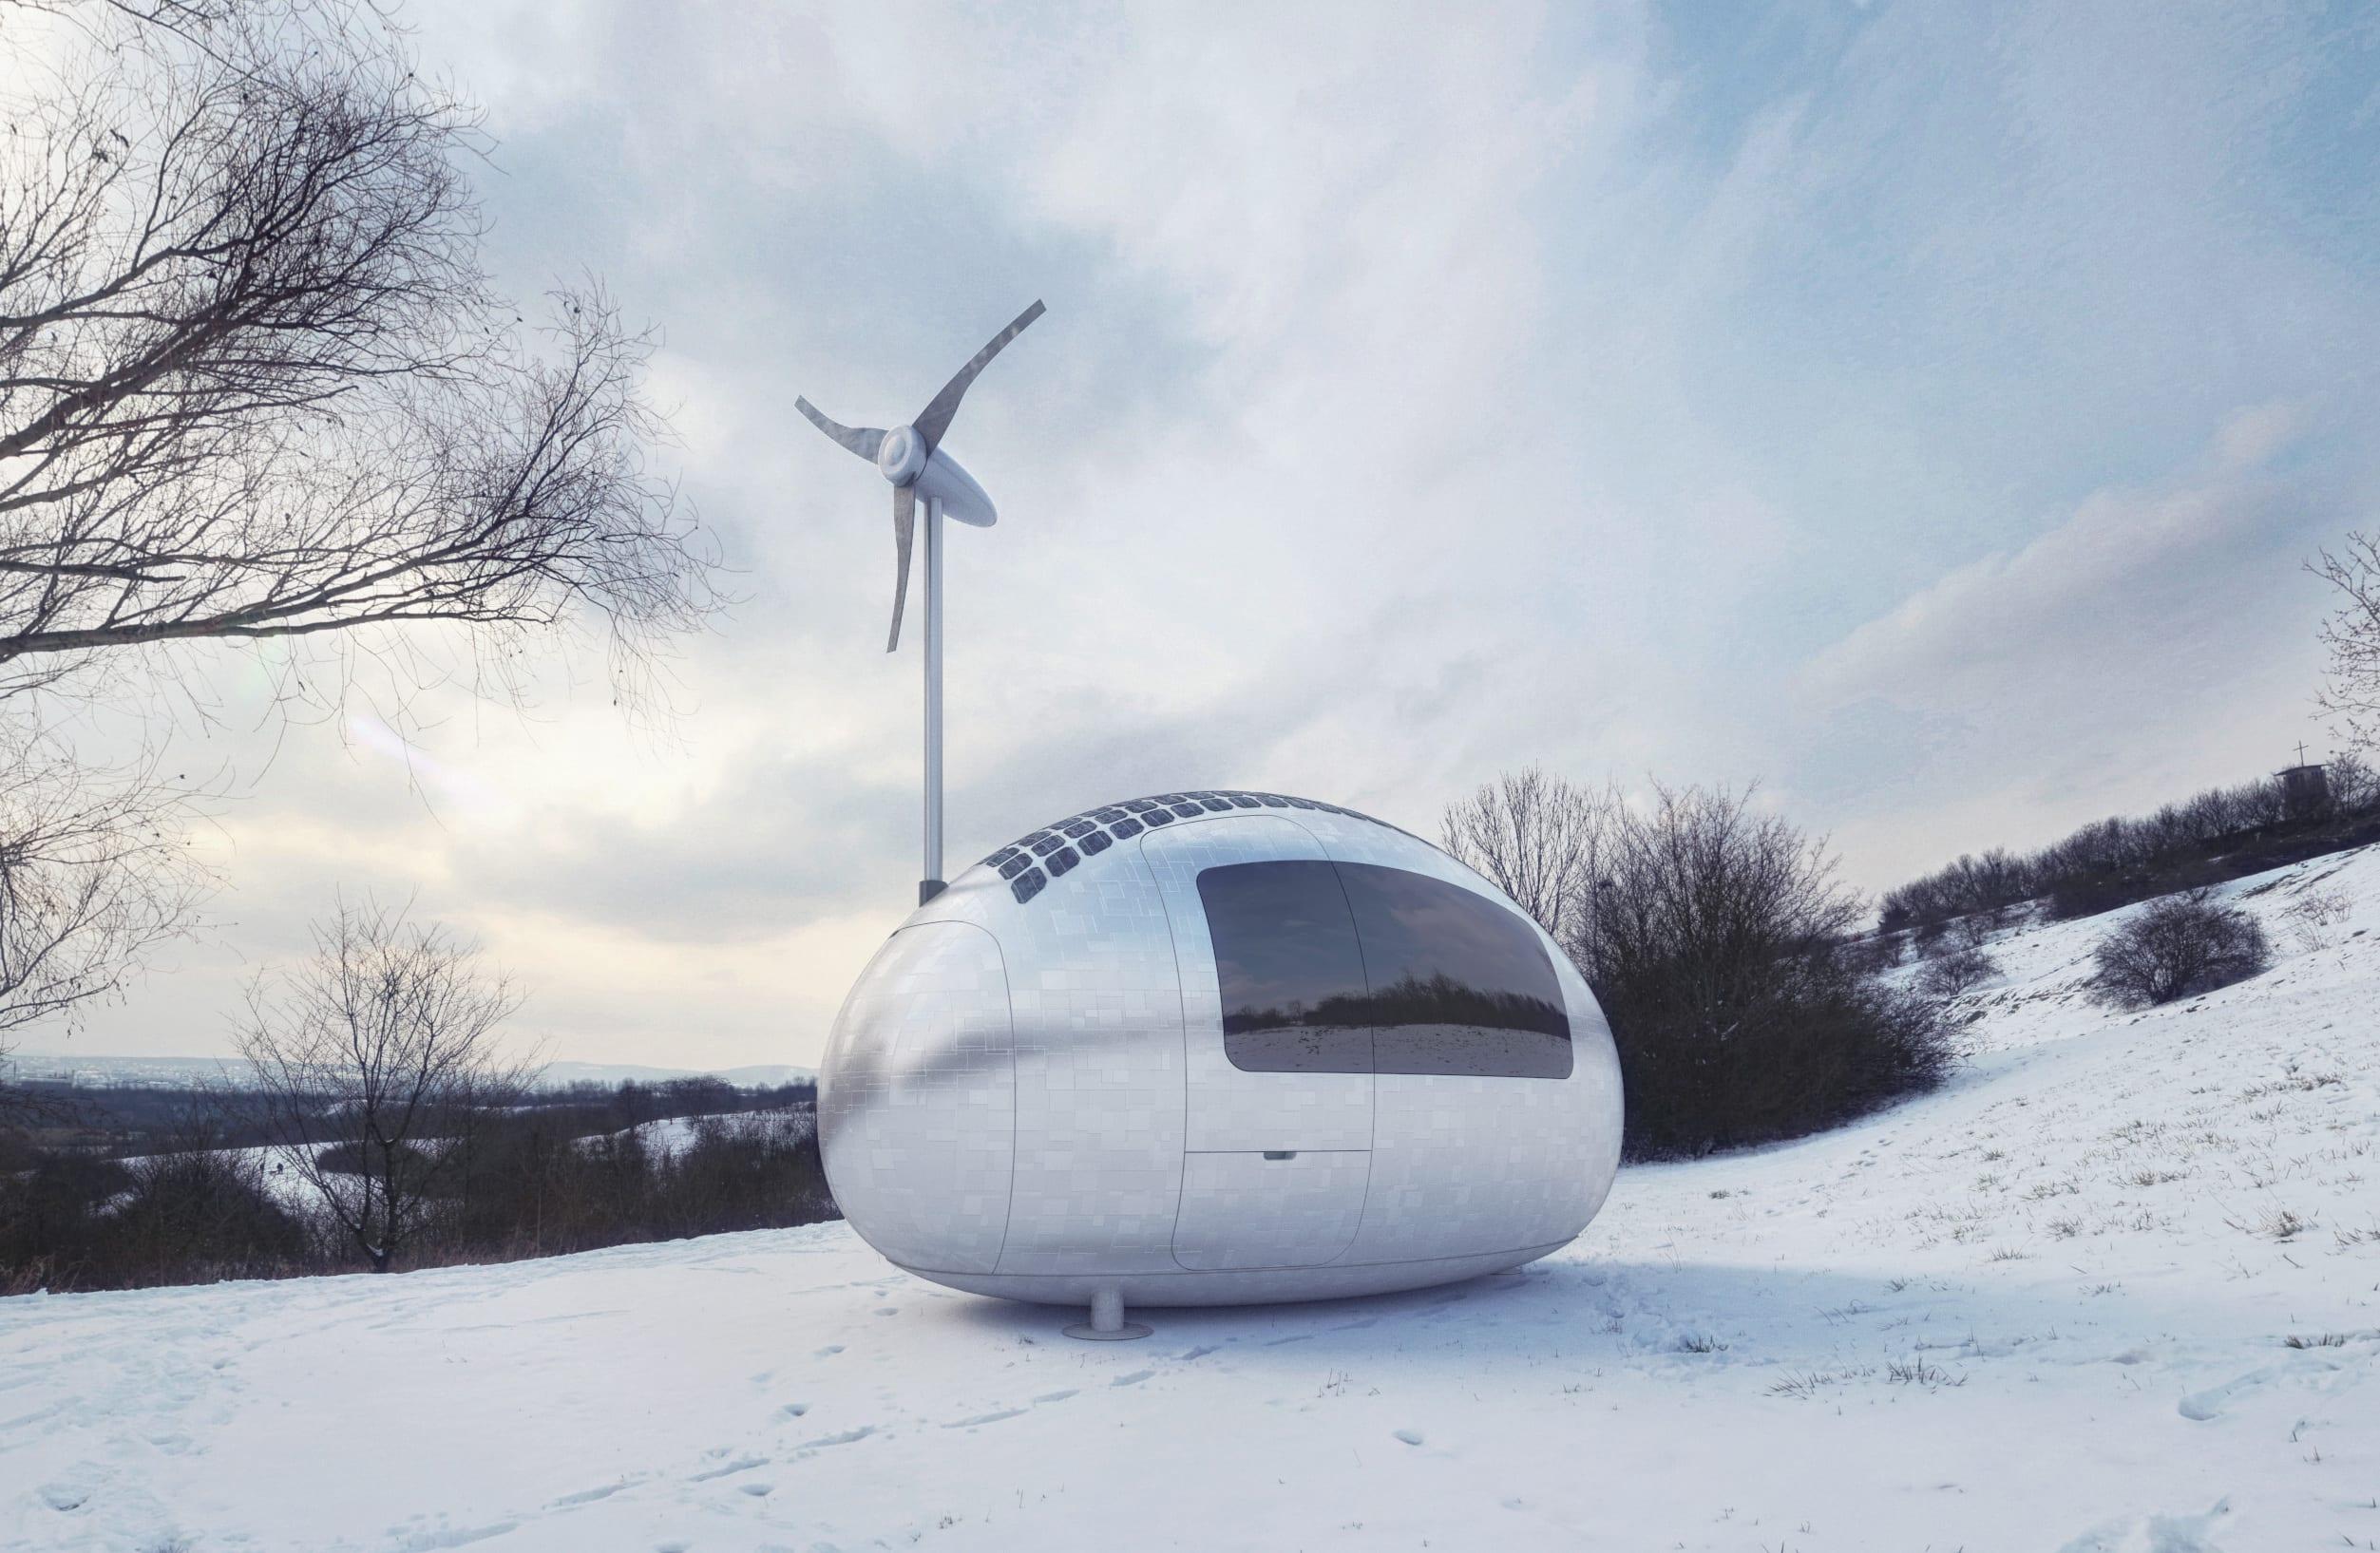 Wohnmobil Ecocapsule  das mobile Niedrigenergiehaus